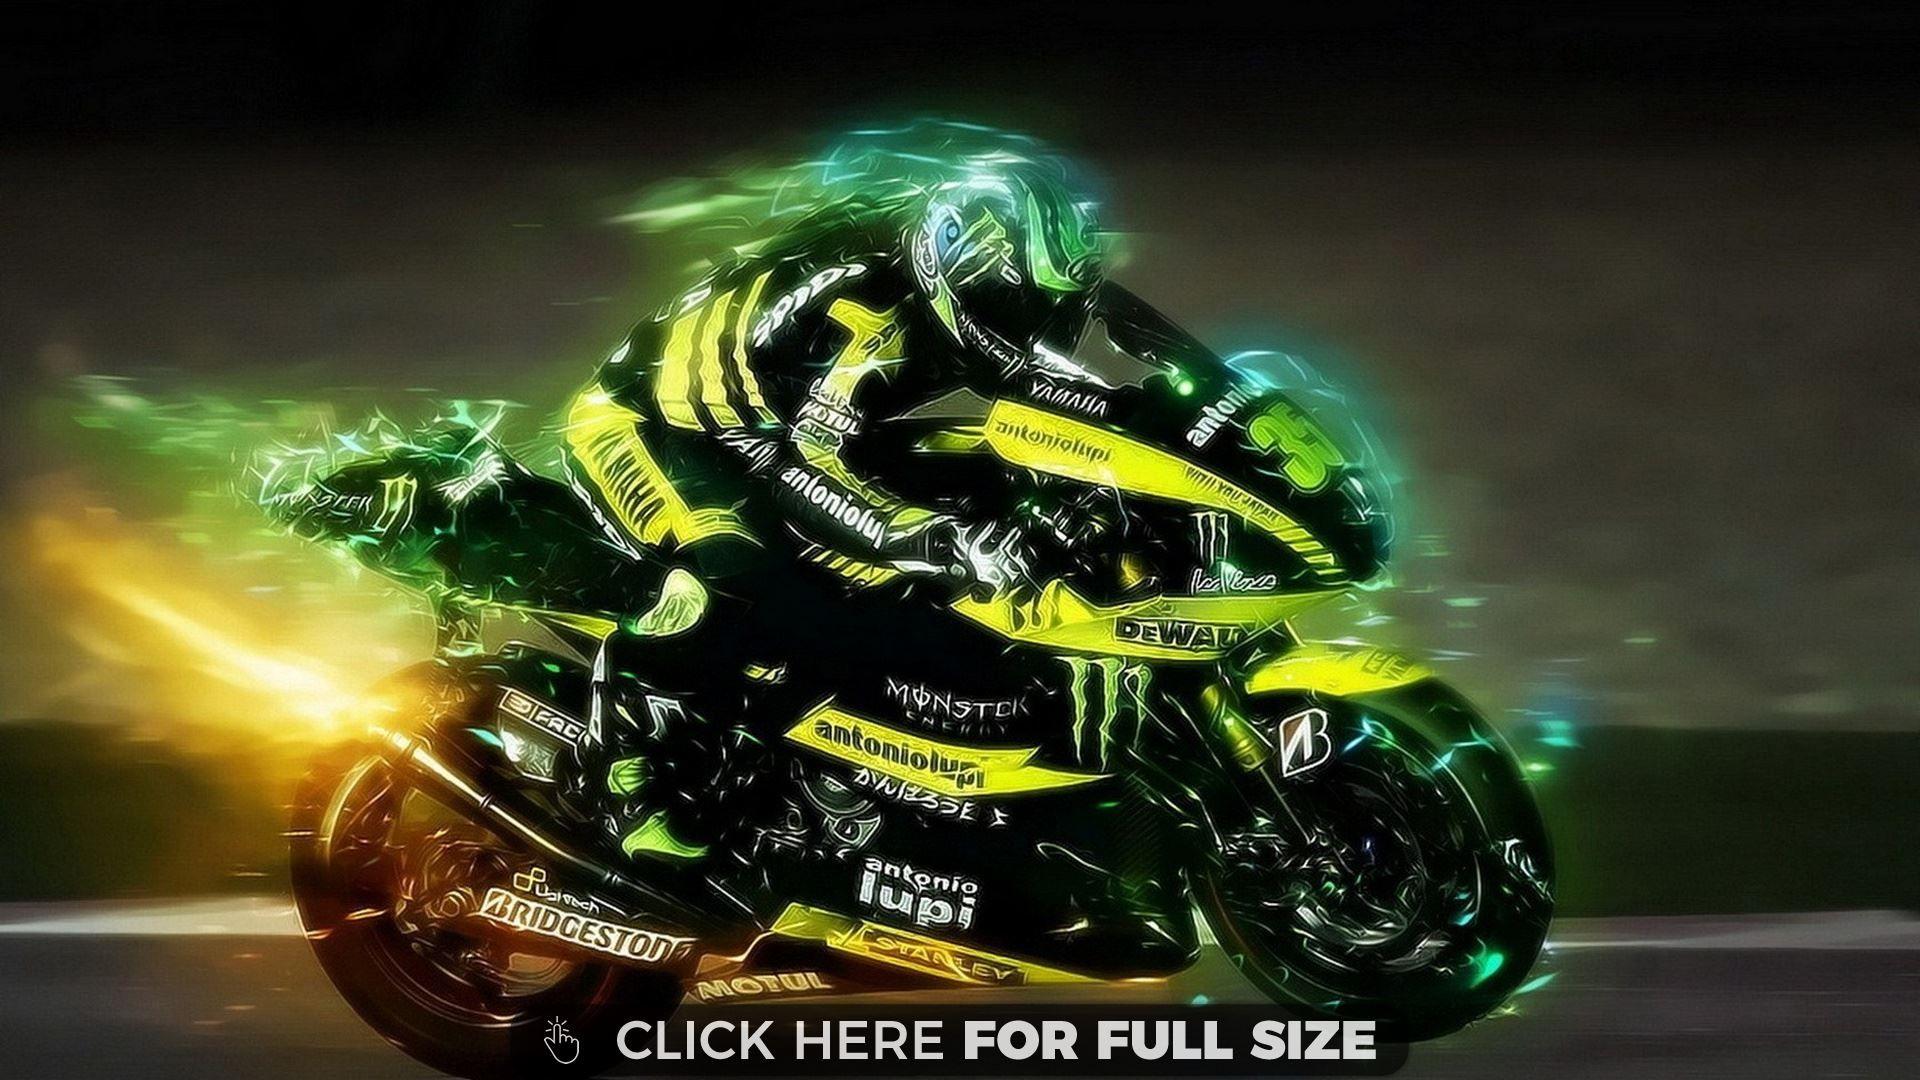 Pictures Motorcycles Bikes Spo 3789 Wallpaper